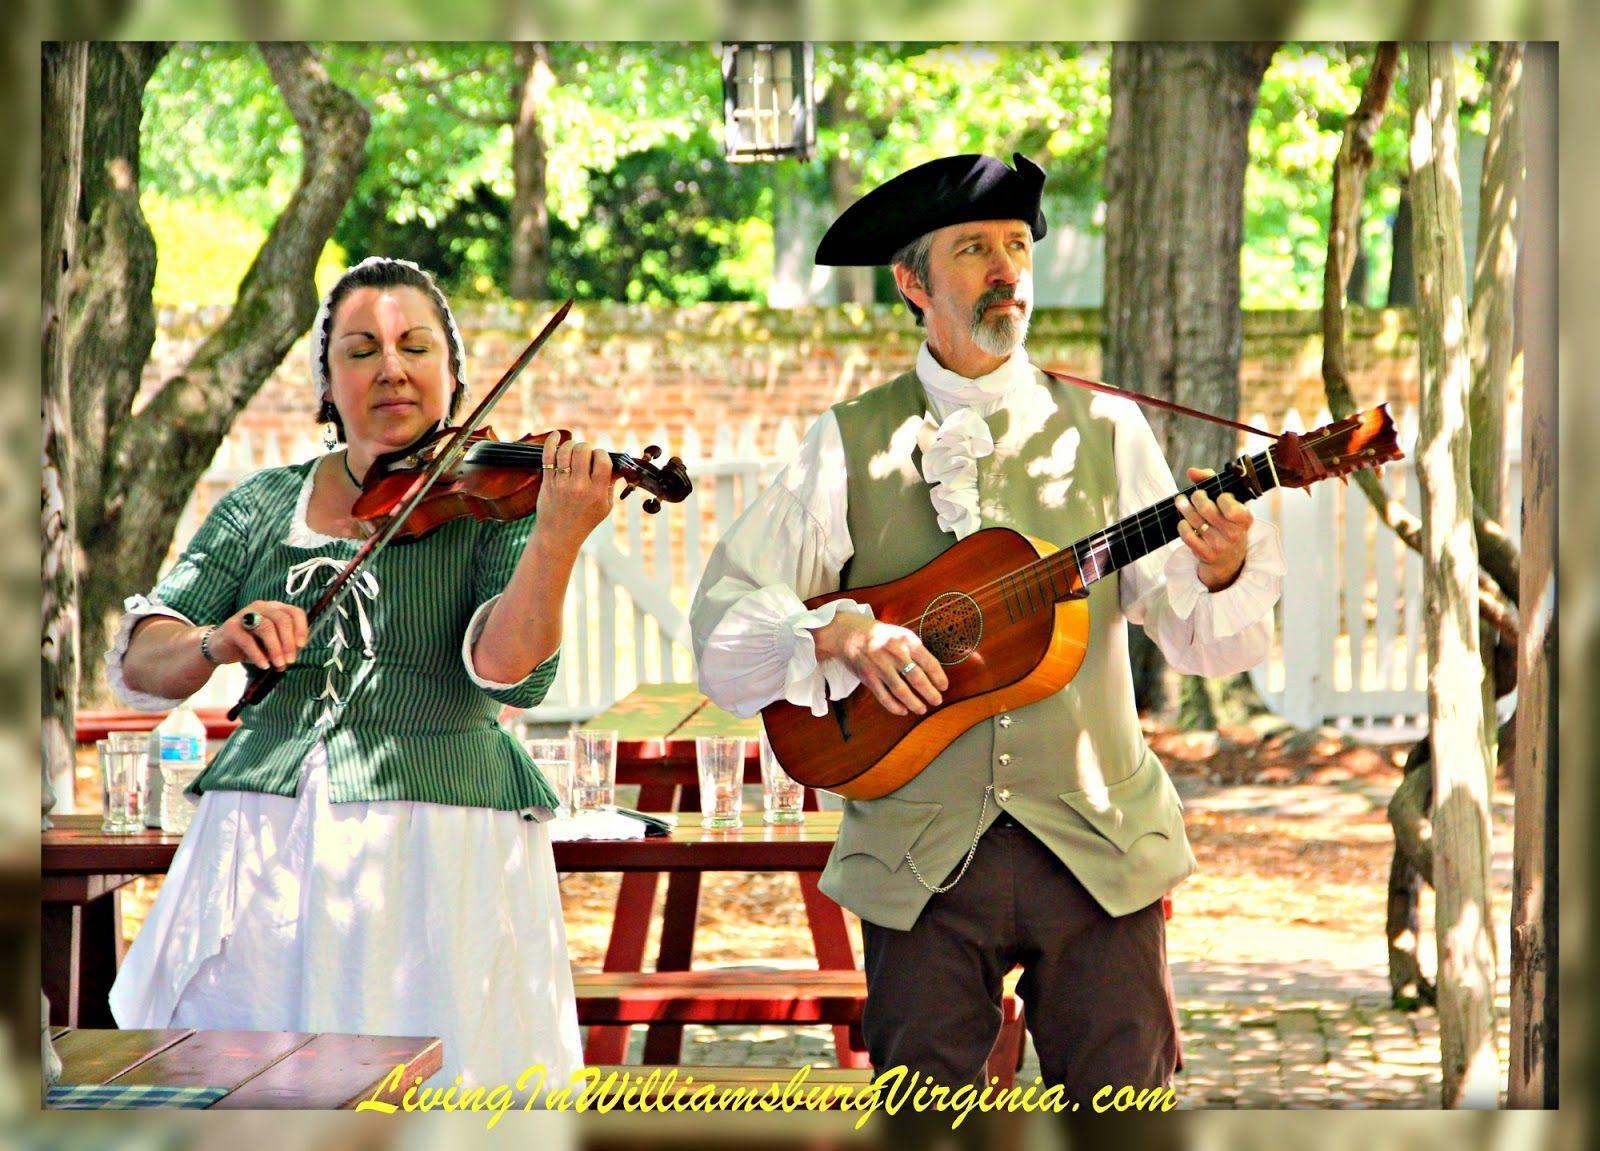 Dinner music colonial williamsburg va musicians play for Christina campbell tavern